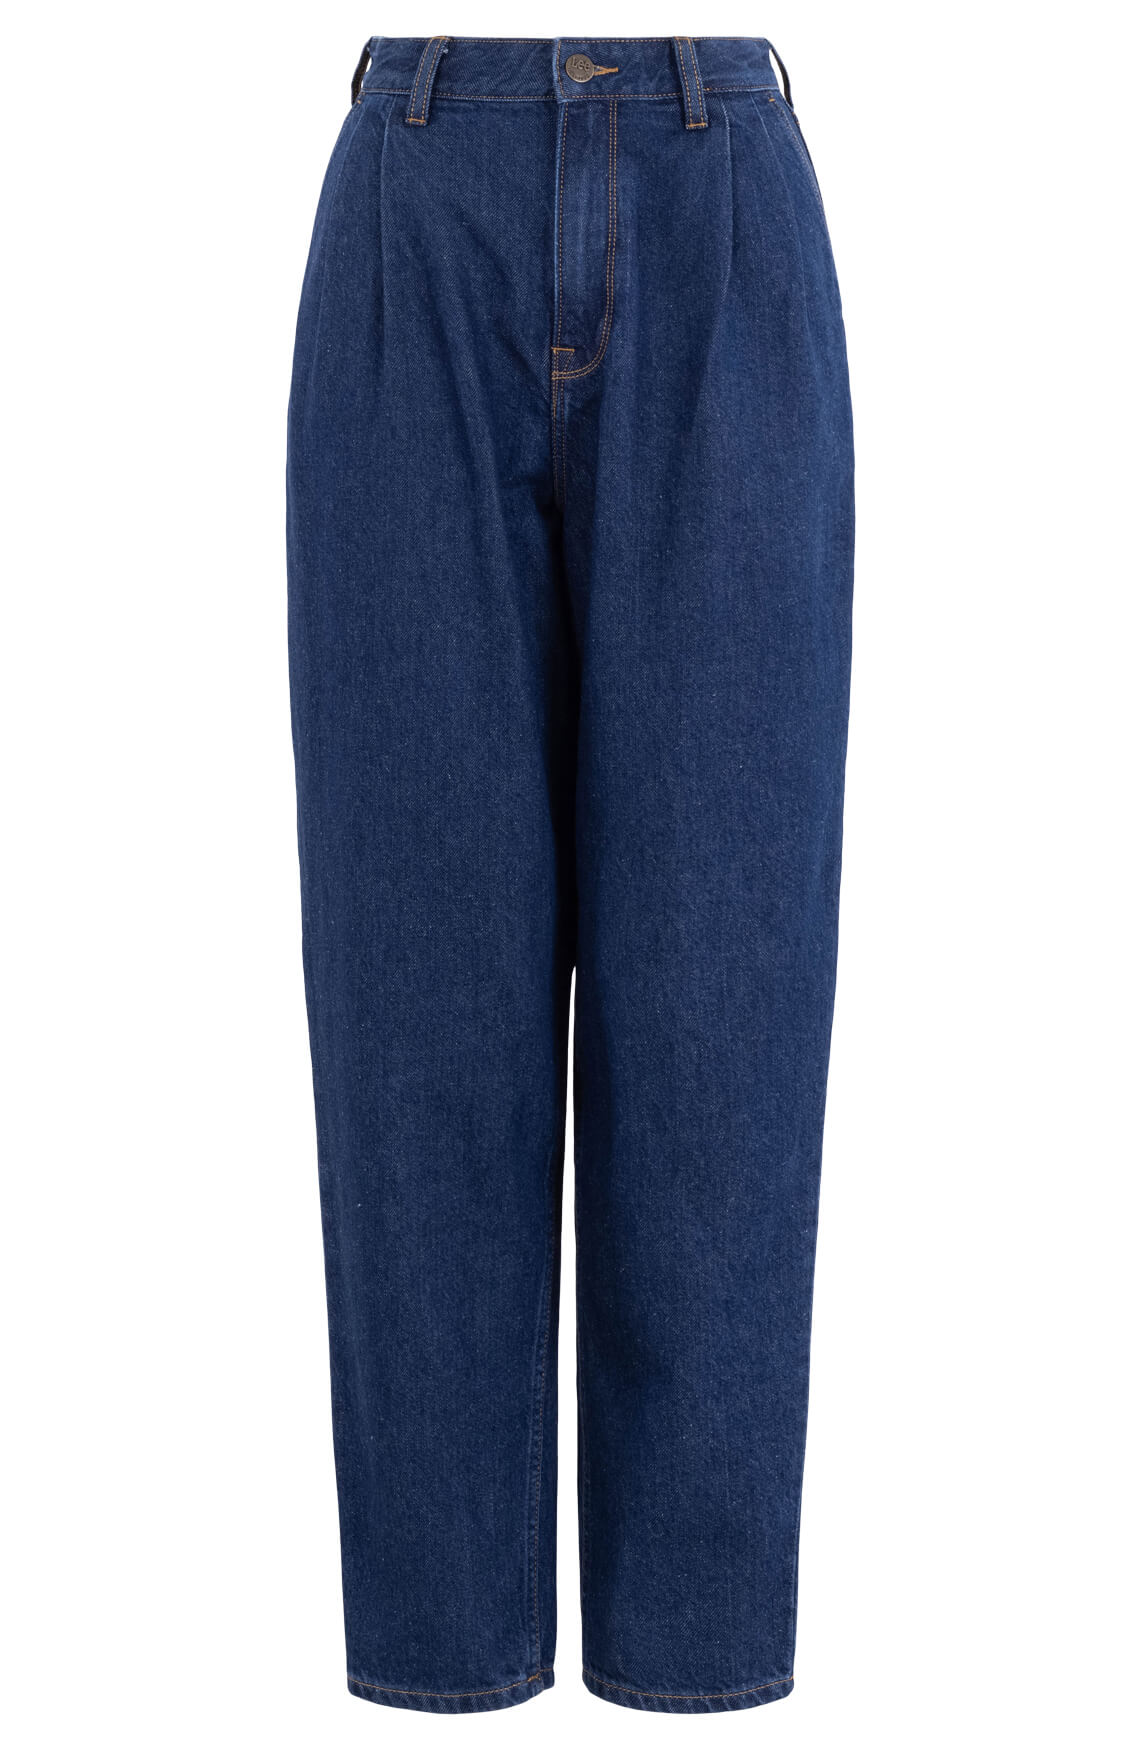 Lee Dames Stella Taper jeans Blauw